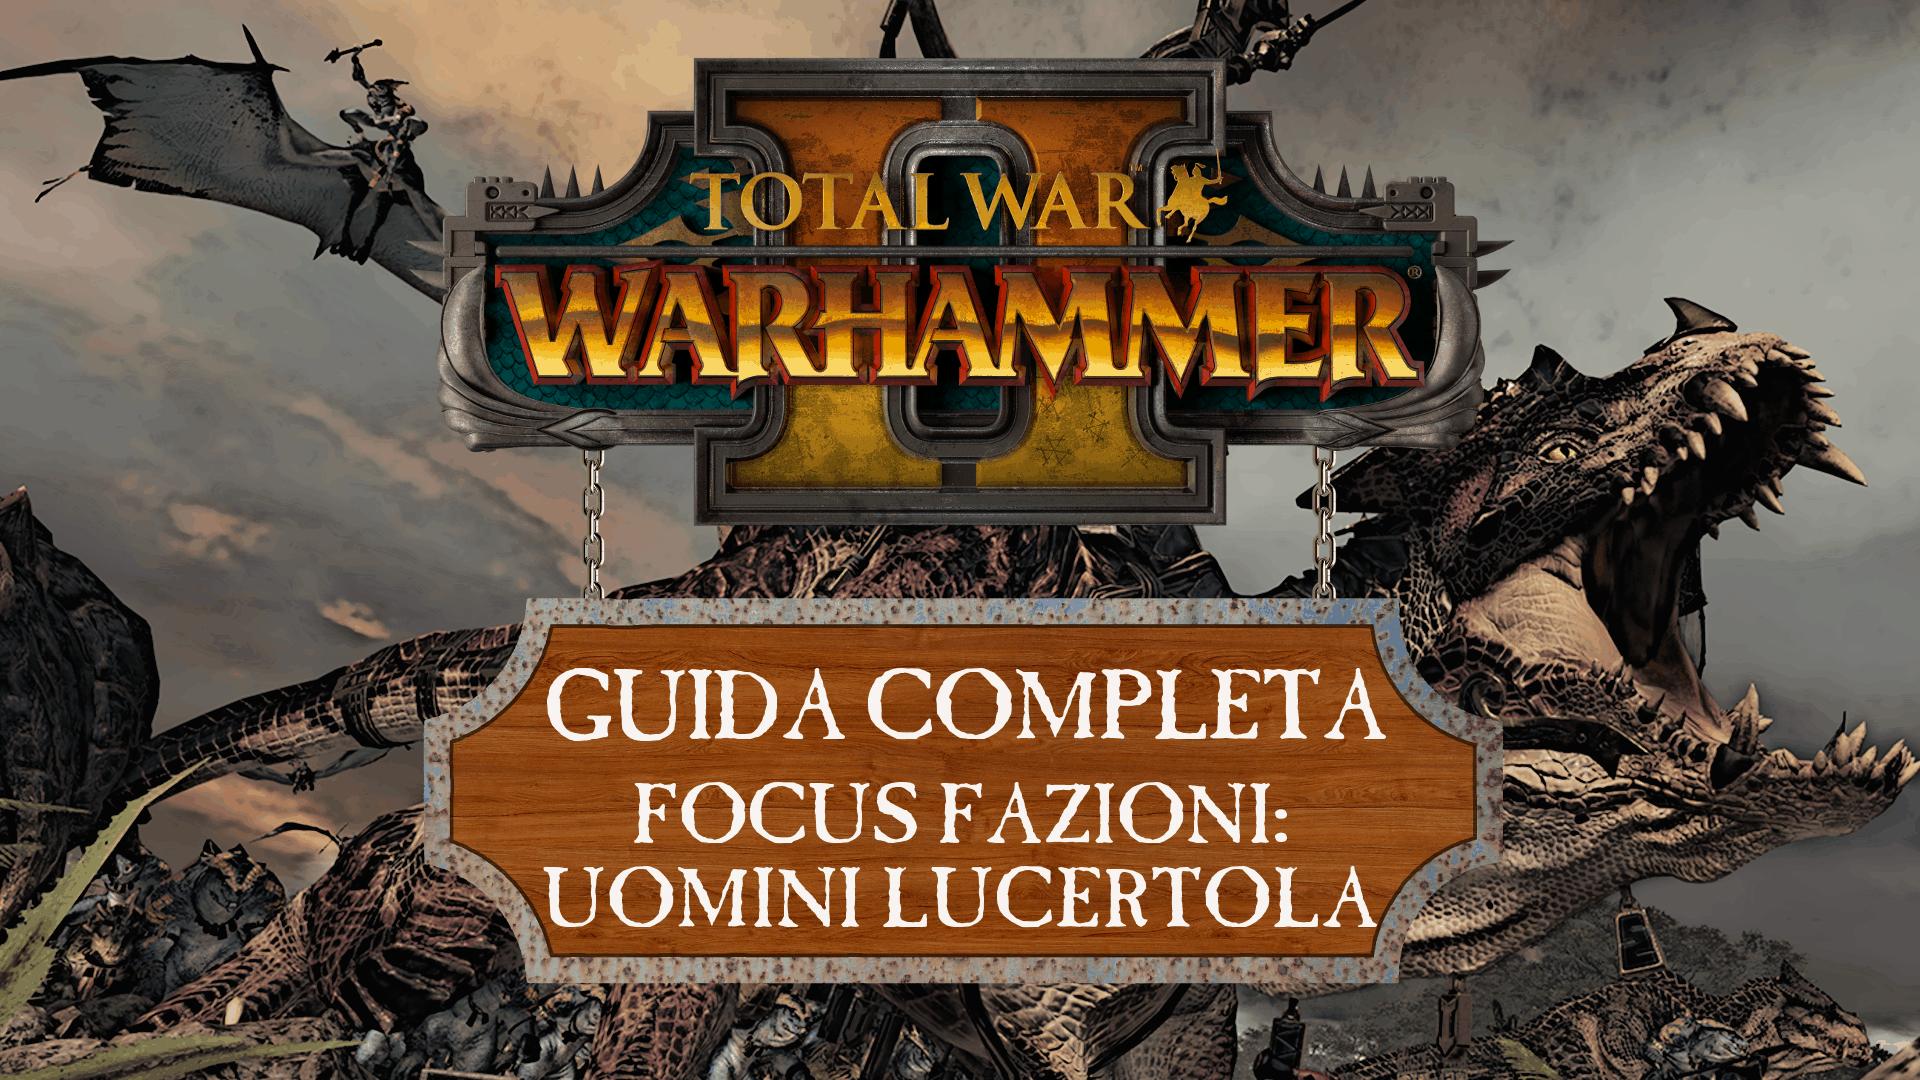 Guida a Total War: Warhammer II – Uomini Lucertola